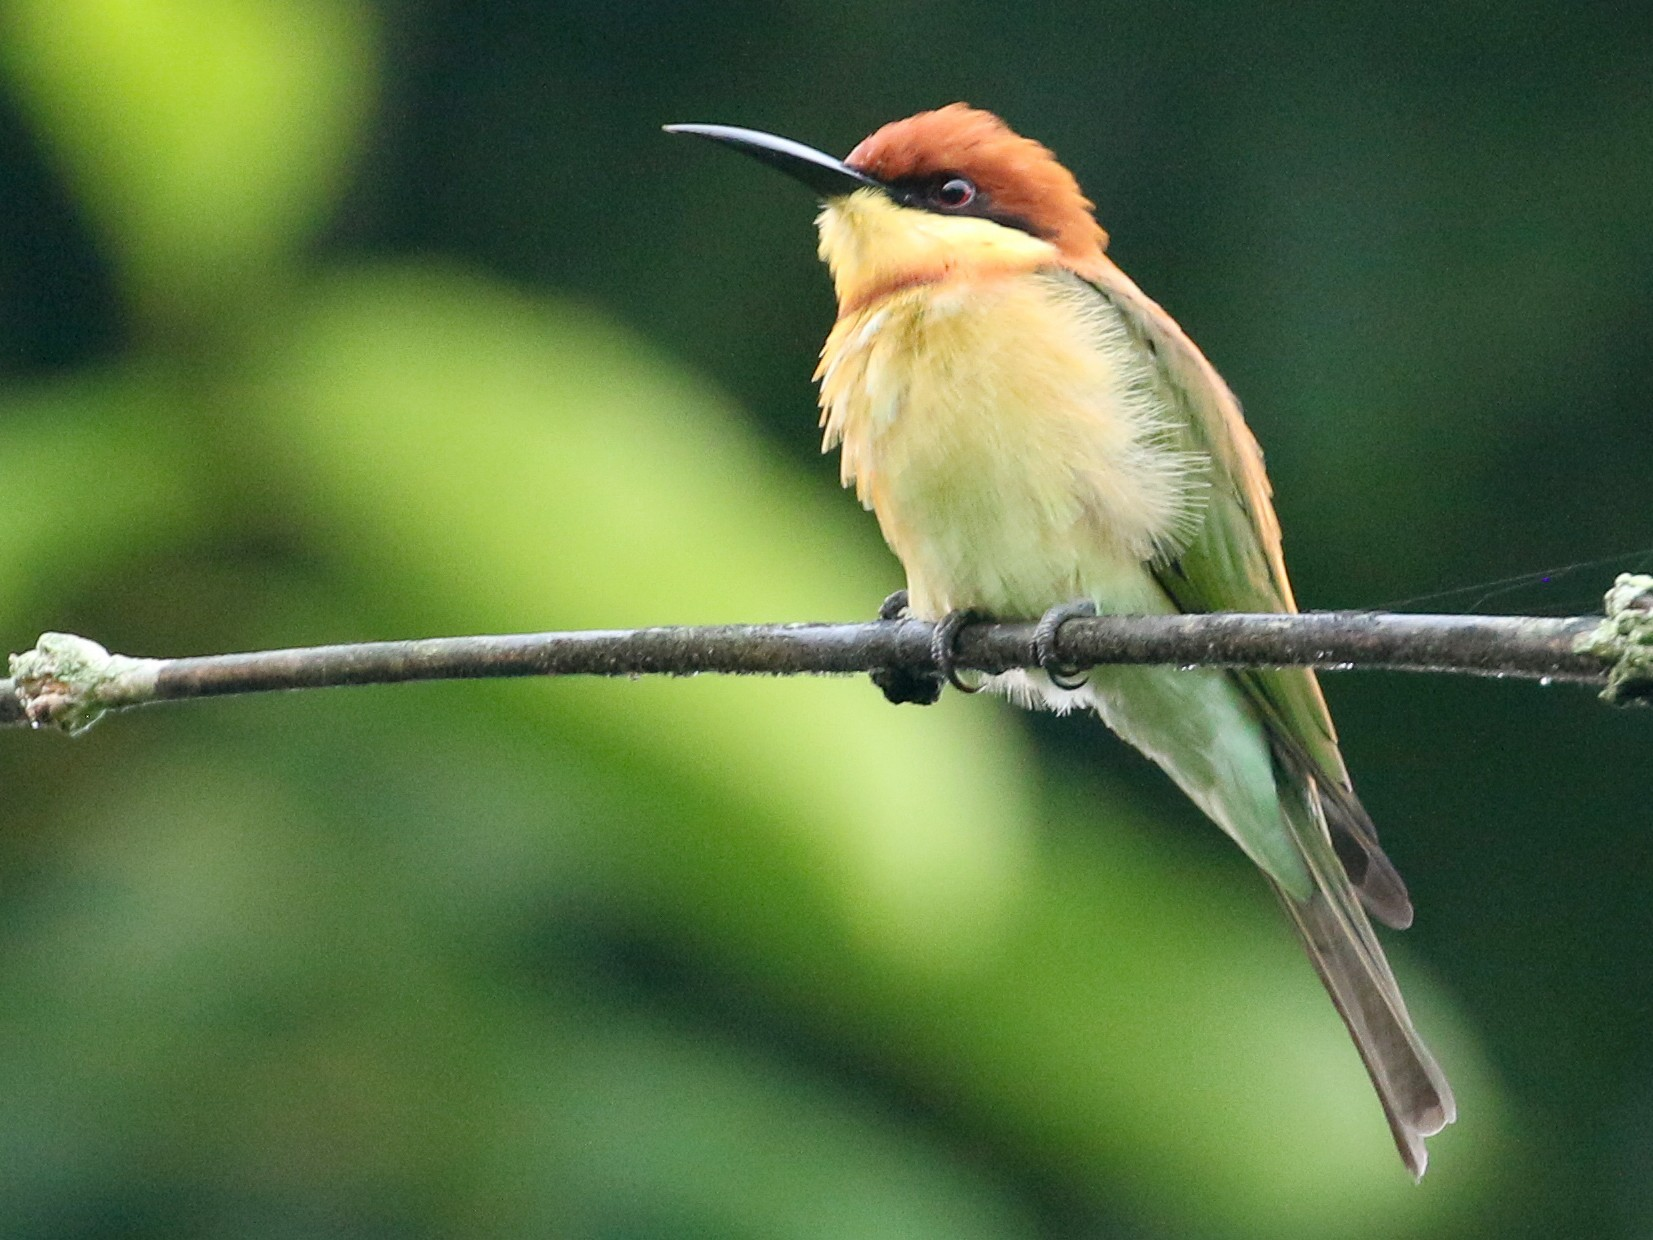 Chestnut-headed Bee-eater - Tommy Pedersen